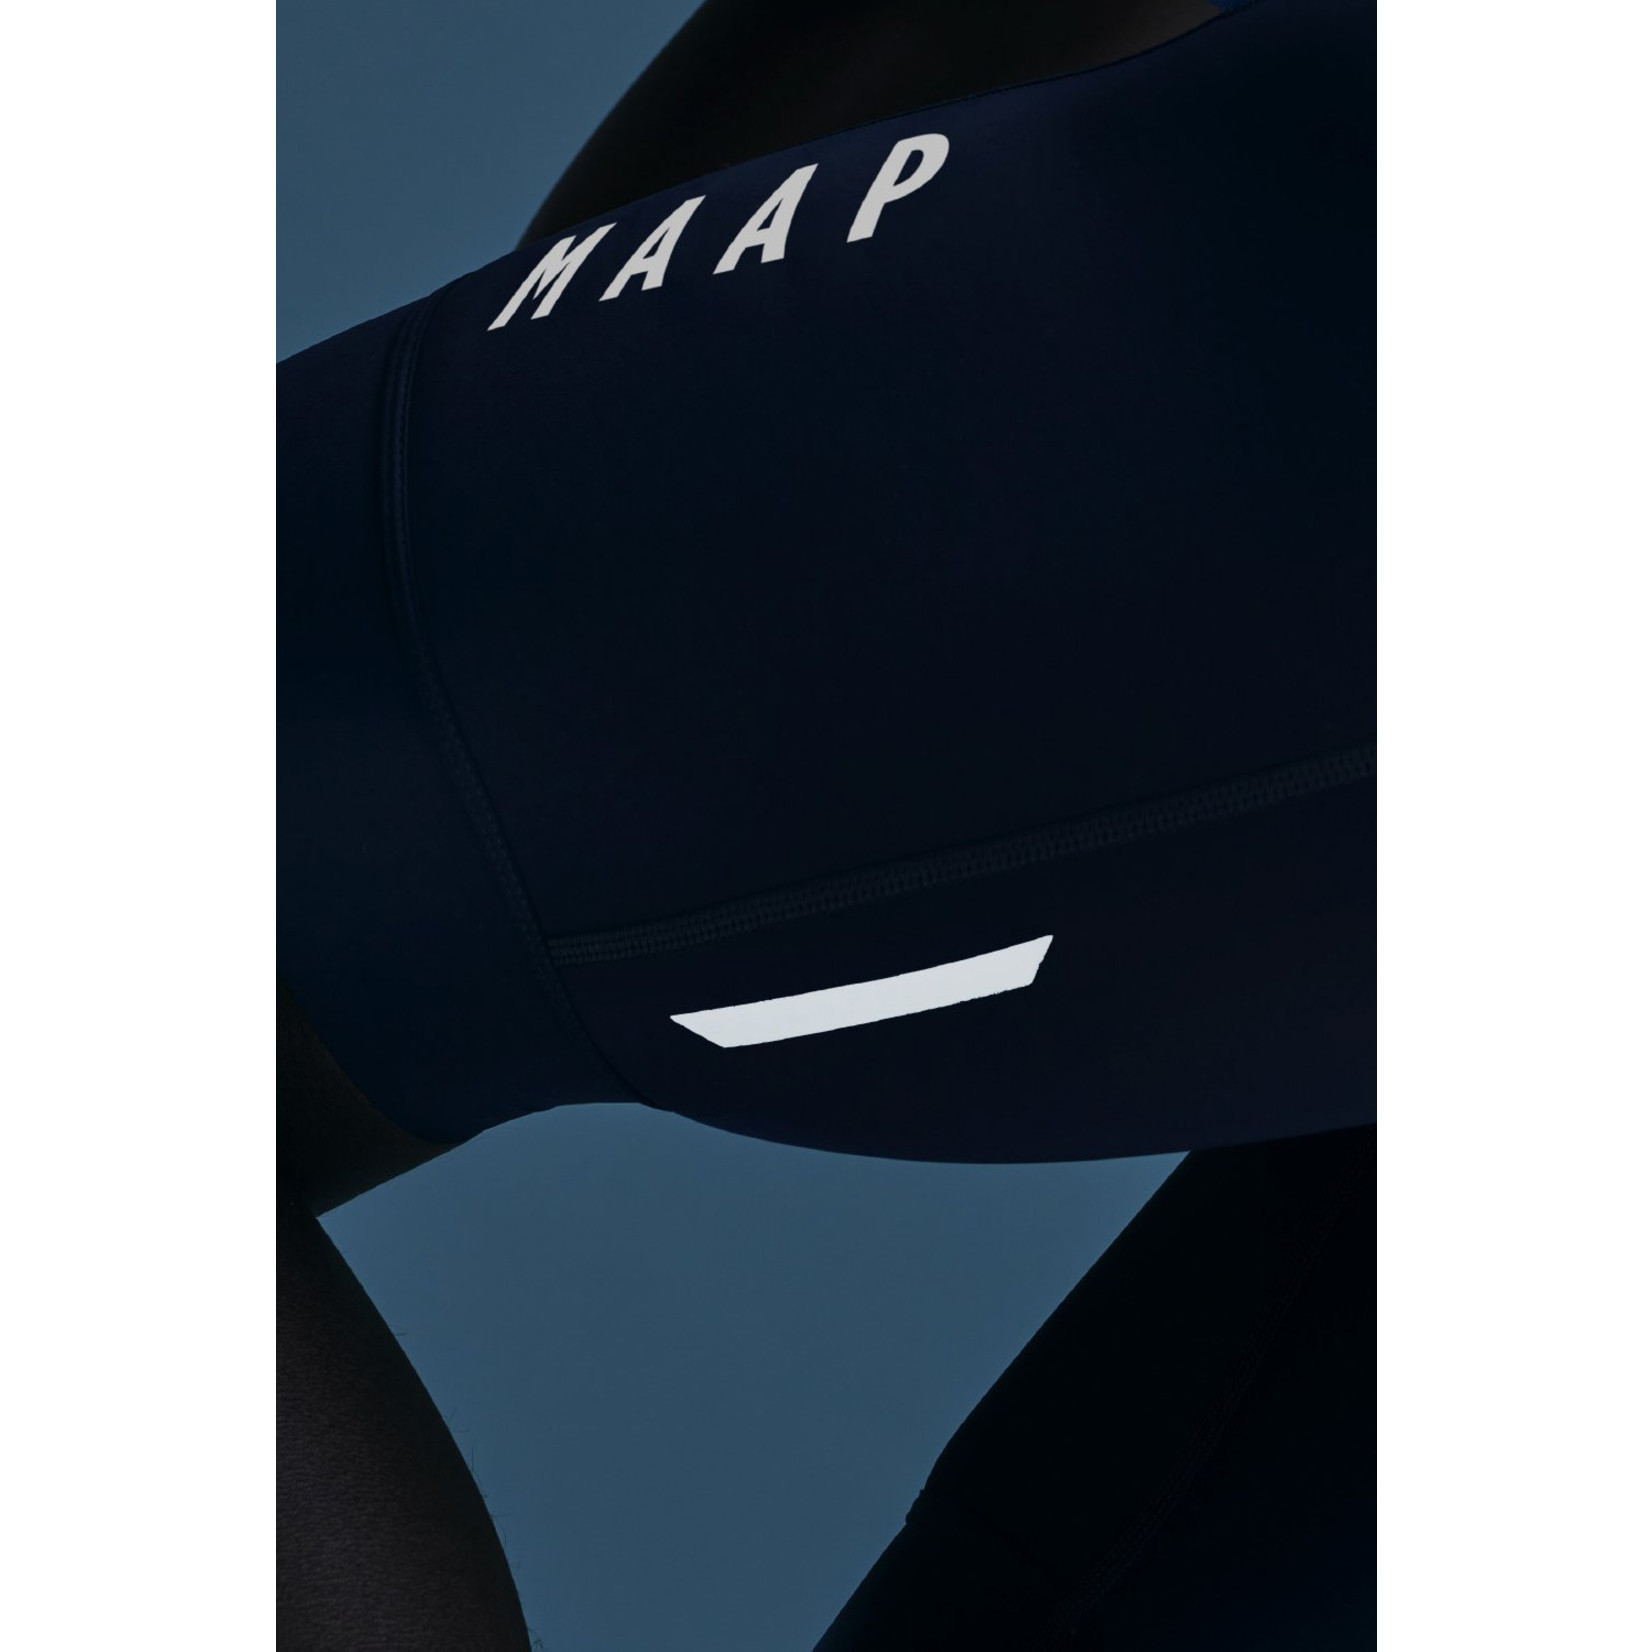 Maap MAAP Team Bib Evo - Navy / White